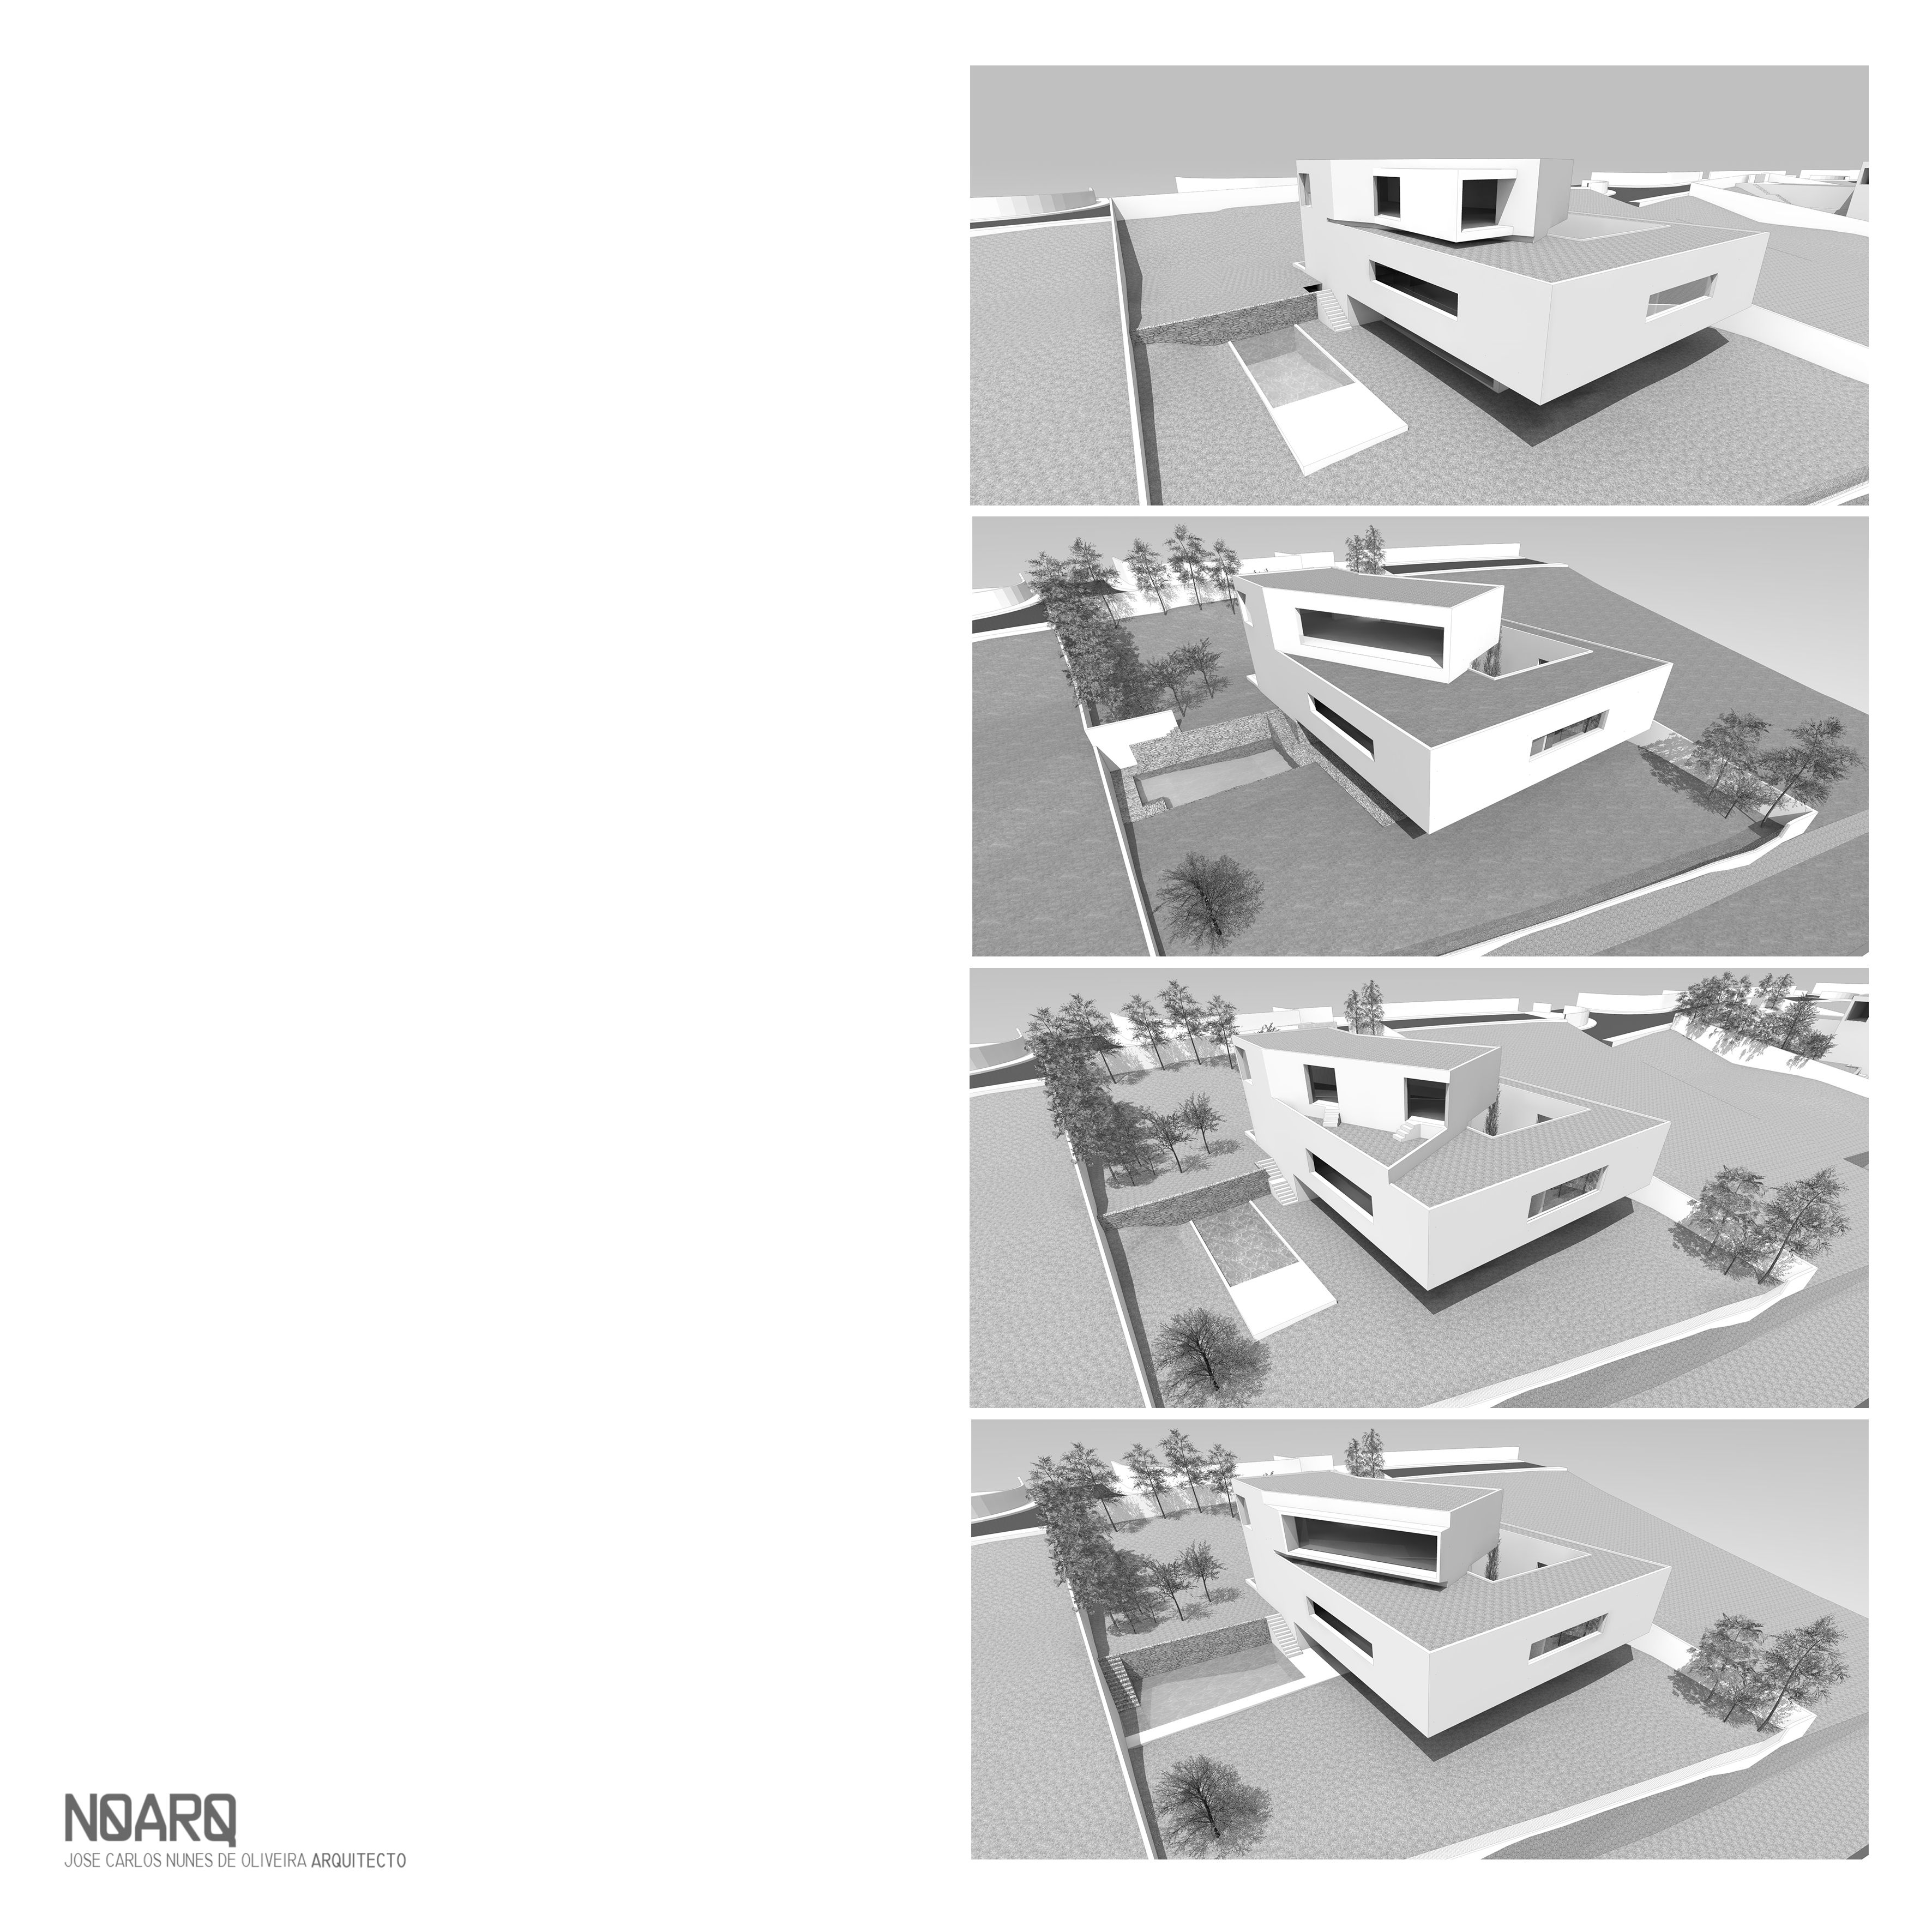 RPFV HOUSE - Preliminary study rendering - abandon version - #noarq #construction #house #scale #model #architecture #white by José Carlos Nunes de Oliveira - © NOARQ